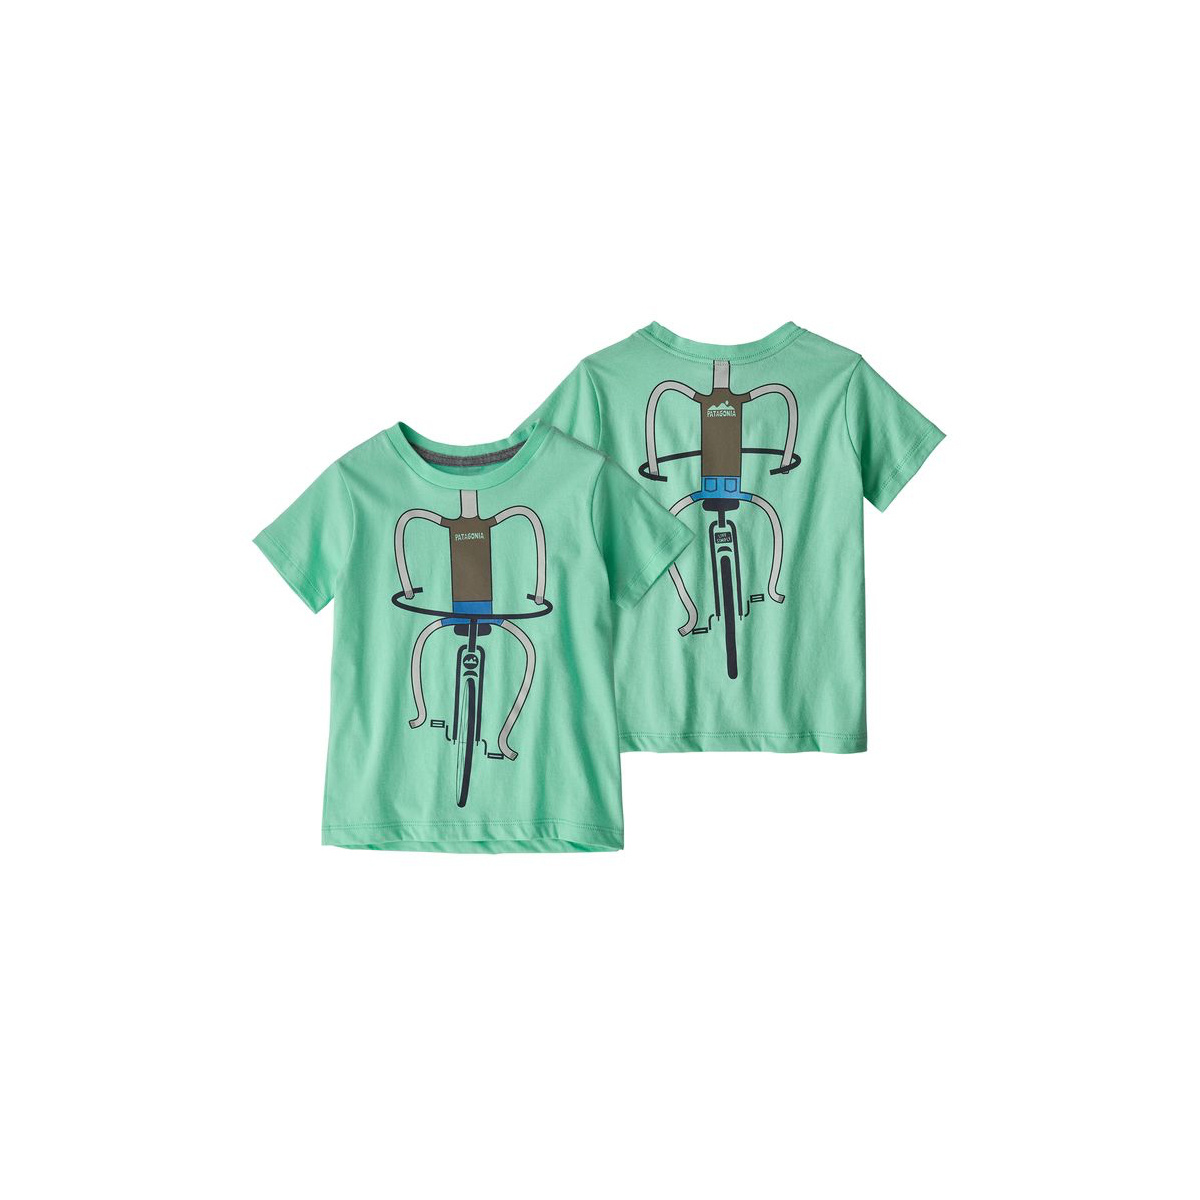 Patagonia Baby Graphic Organic T-Shirt